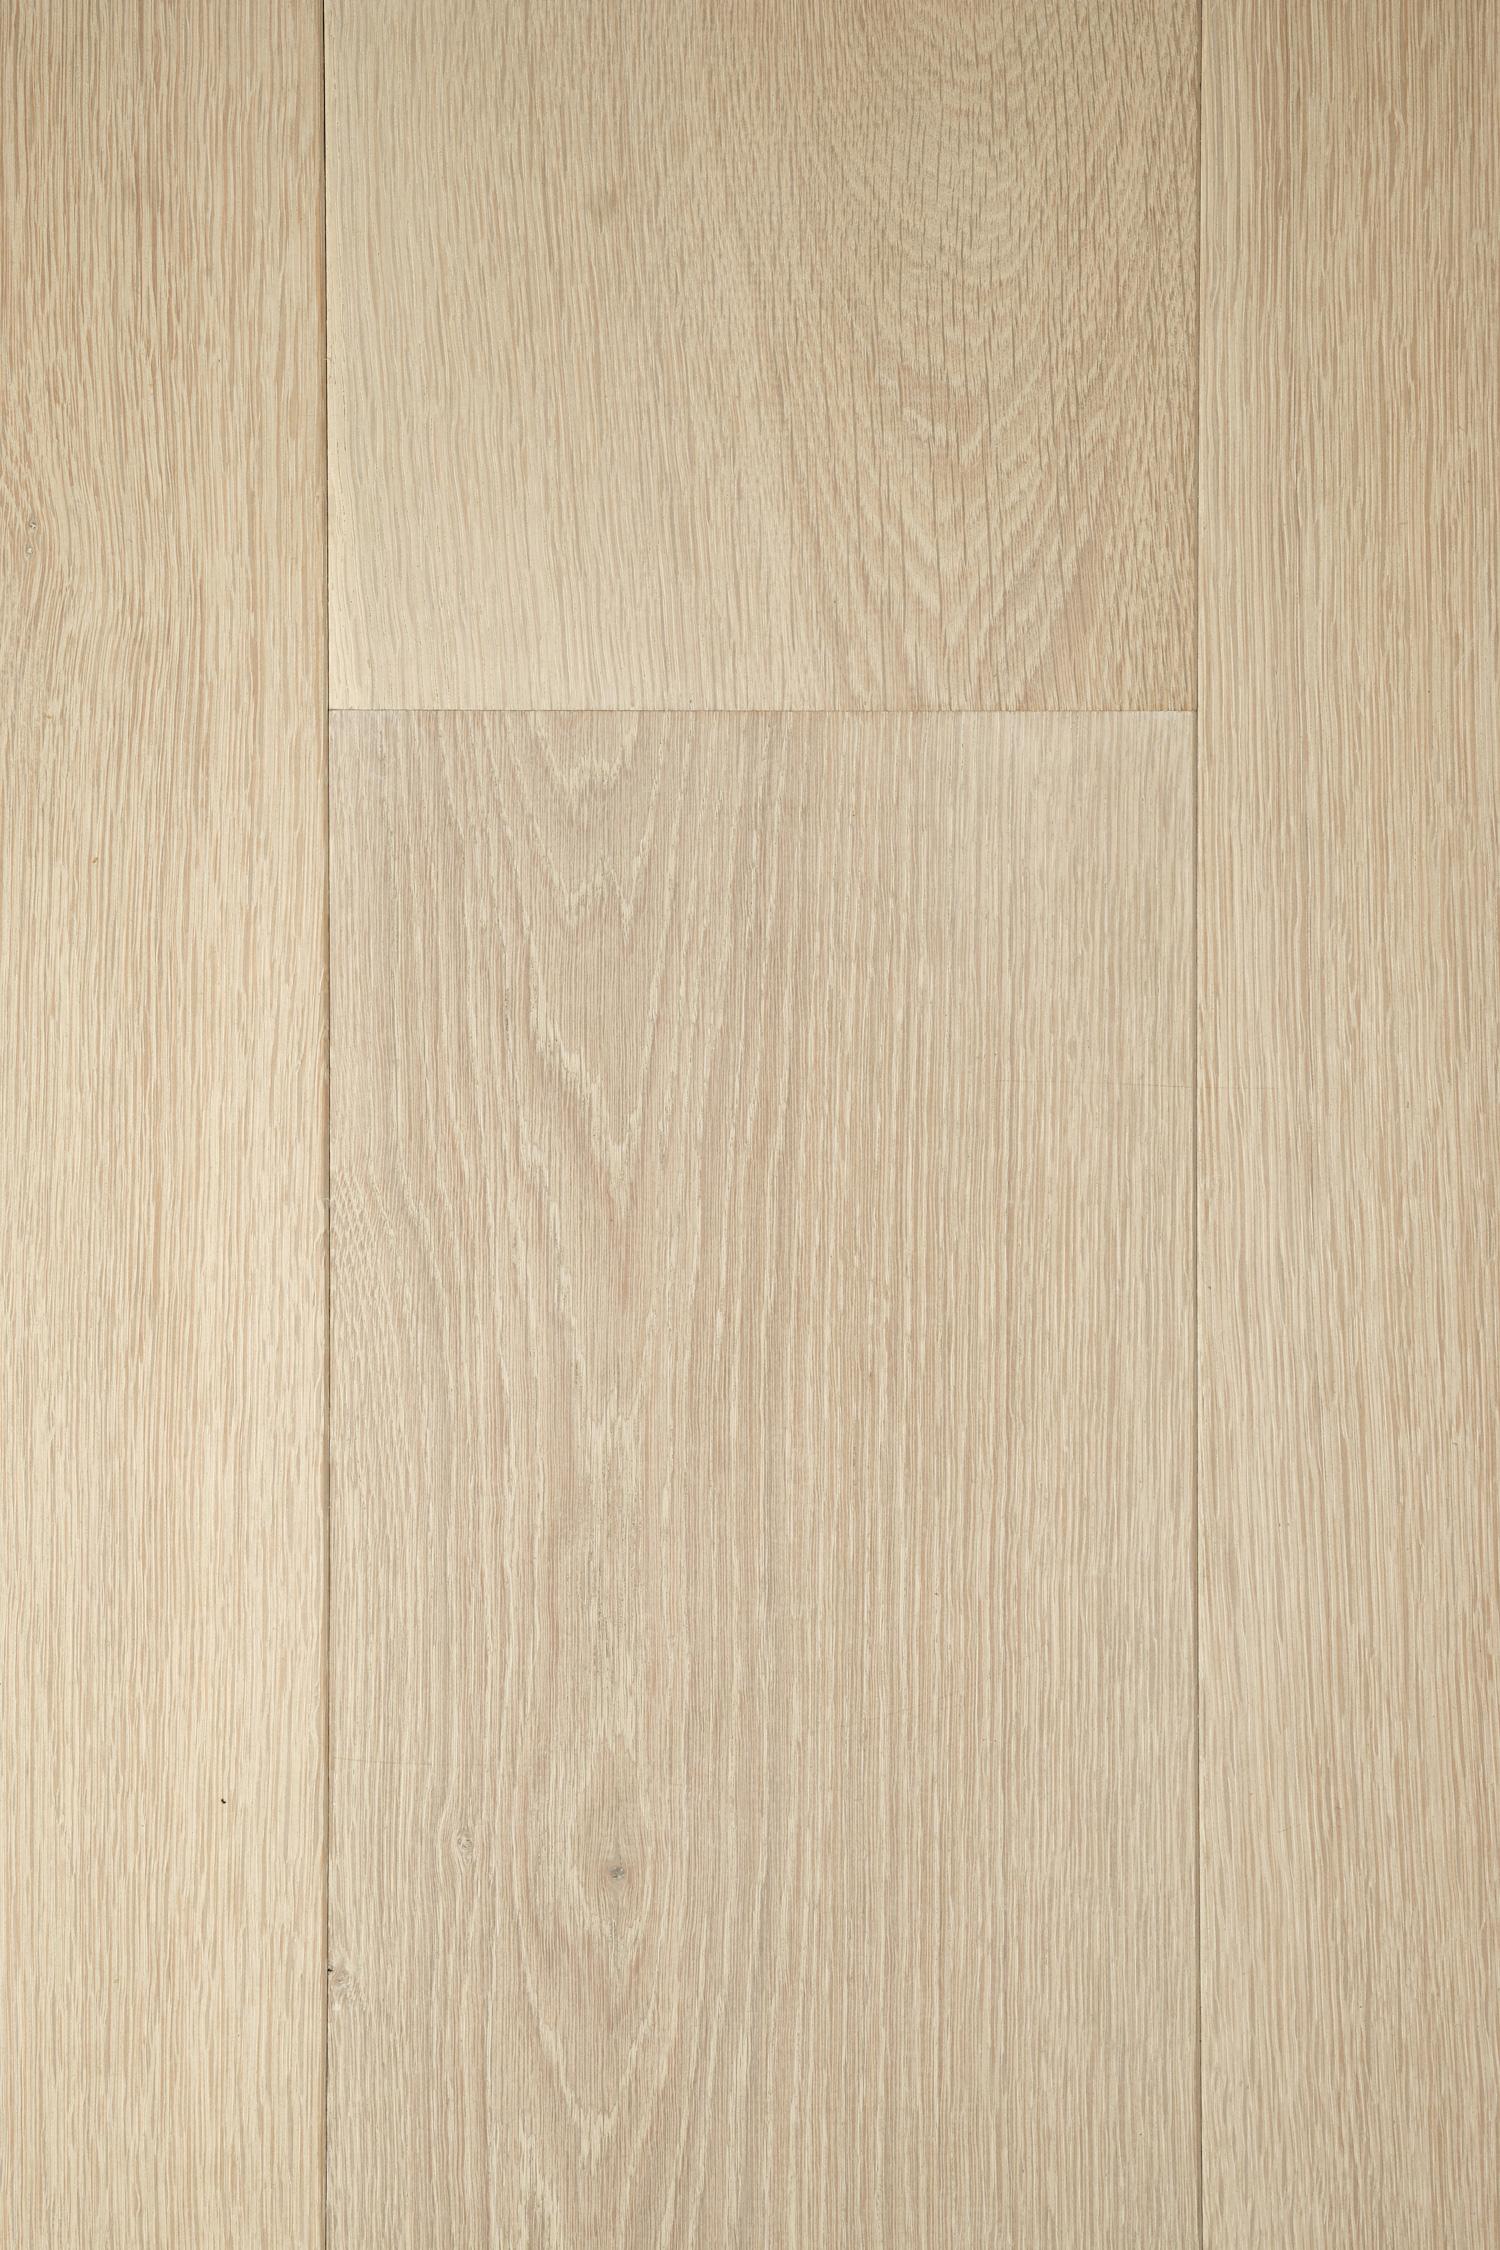 Oak landmark ascott plank